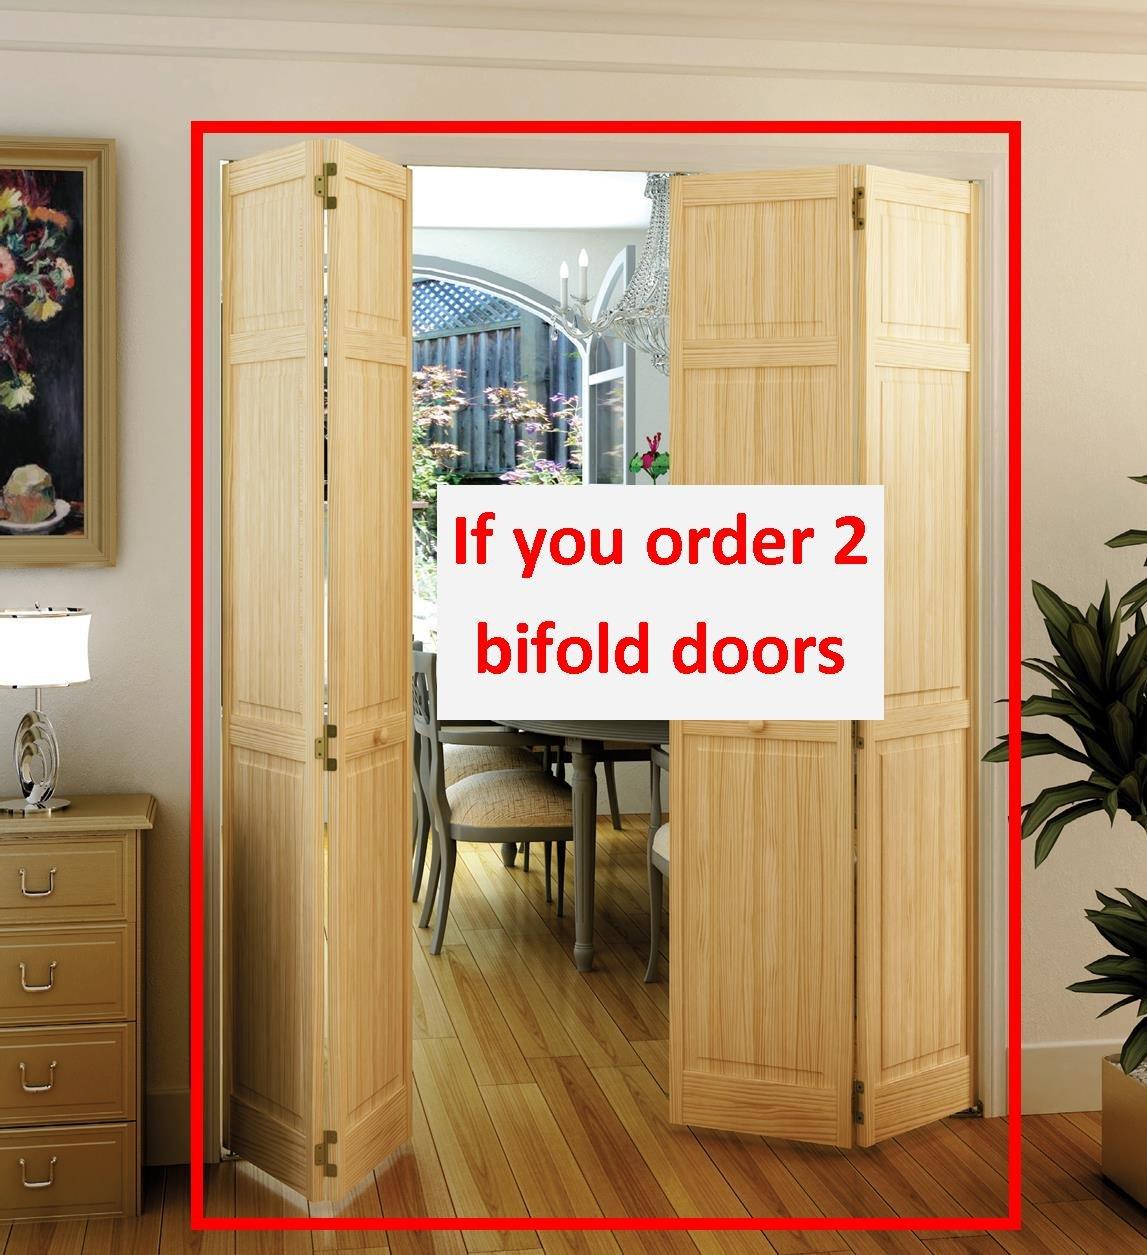 Bi-fold Door Six-panel Style Solid Wood (80x36) - Closet Storage And Organization Systems - Amazon.com & Bi-fold Door Six-panel Style Solid Wood (80x36) - Closet Storage ... Pezcame.Com